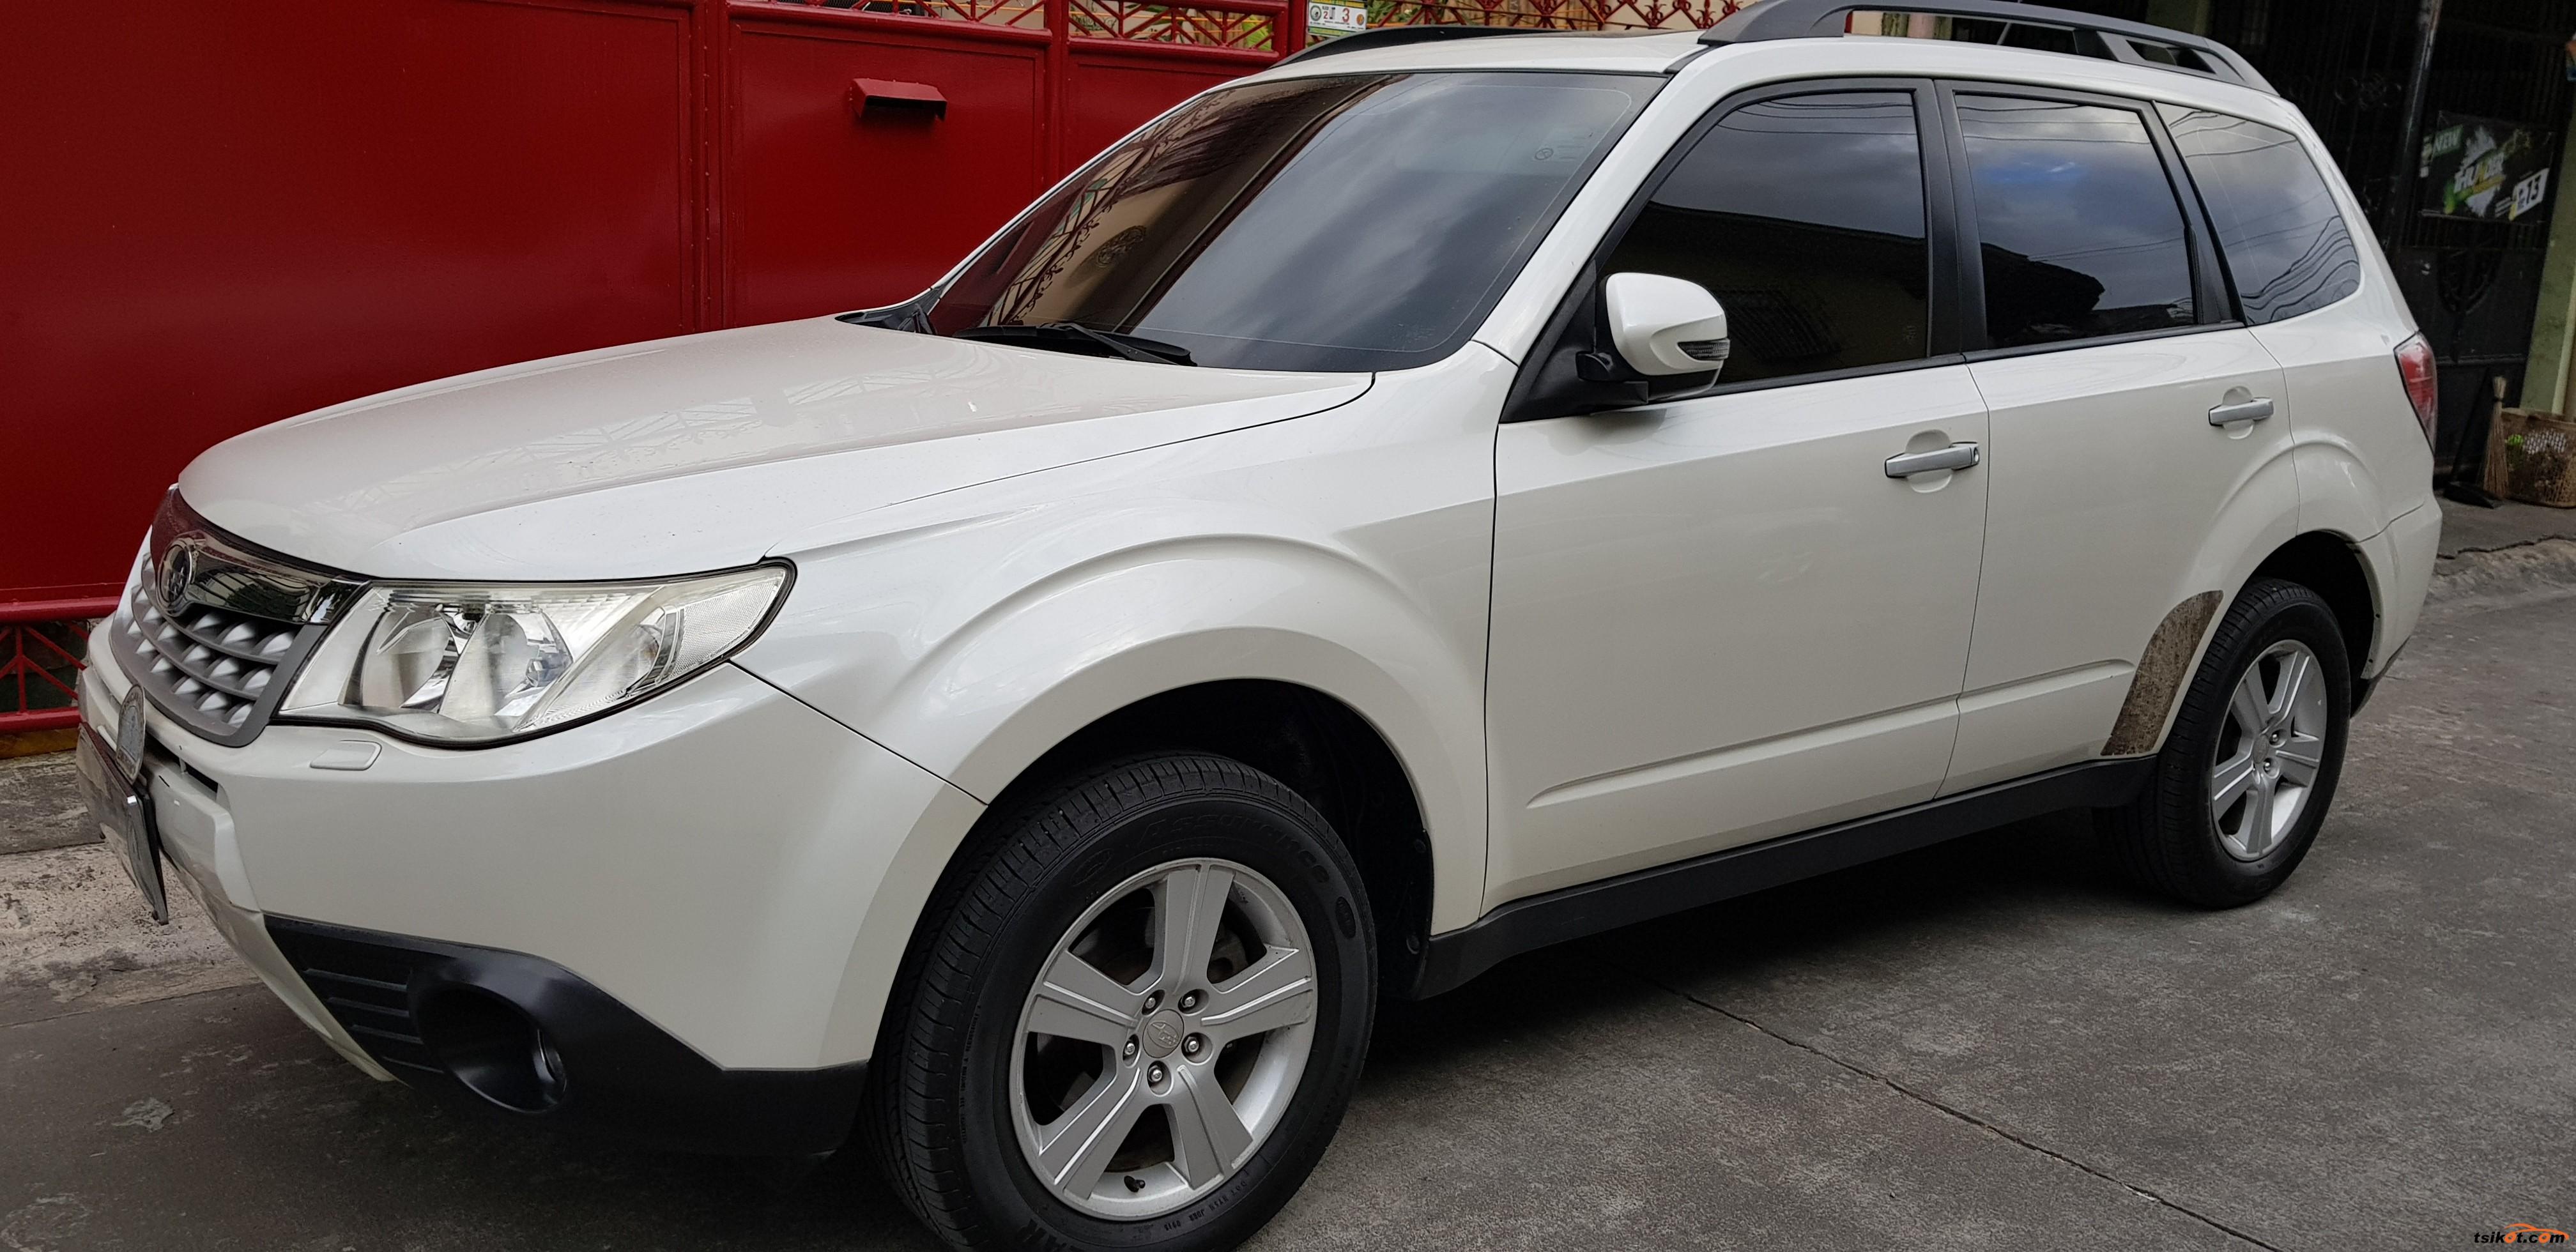 Subaru Forester 2011 - 4